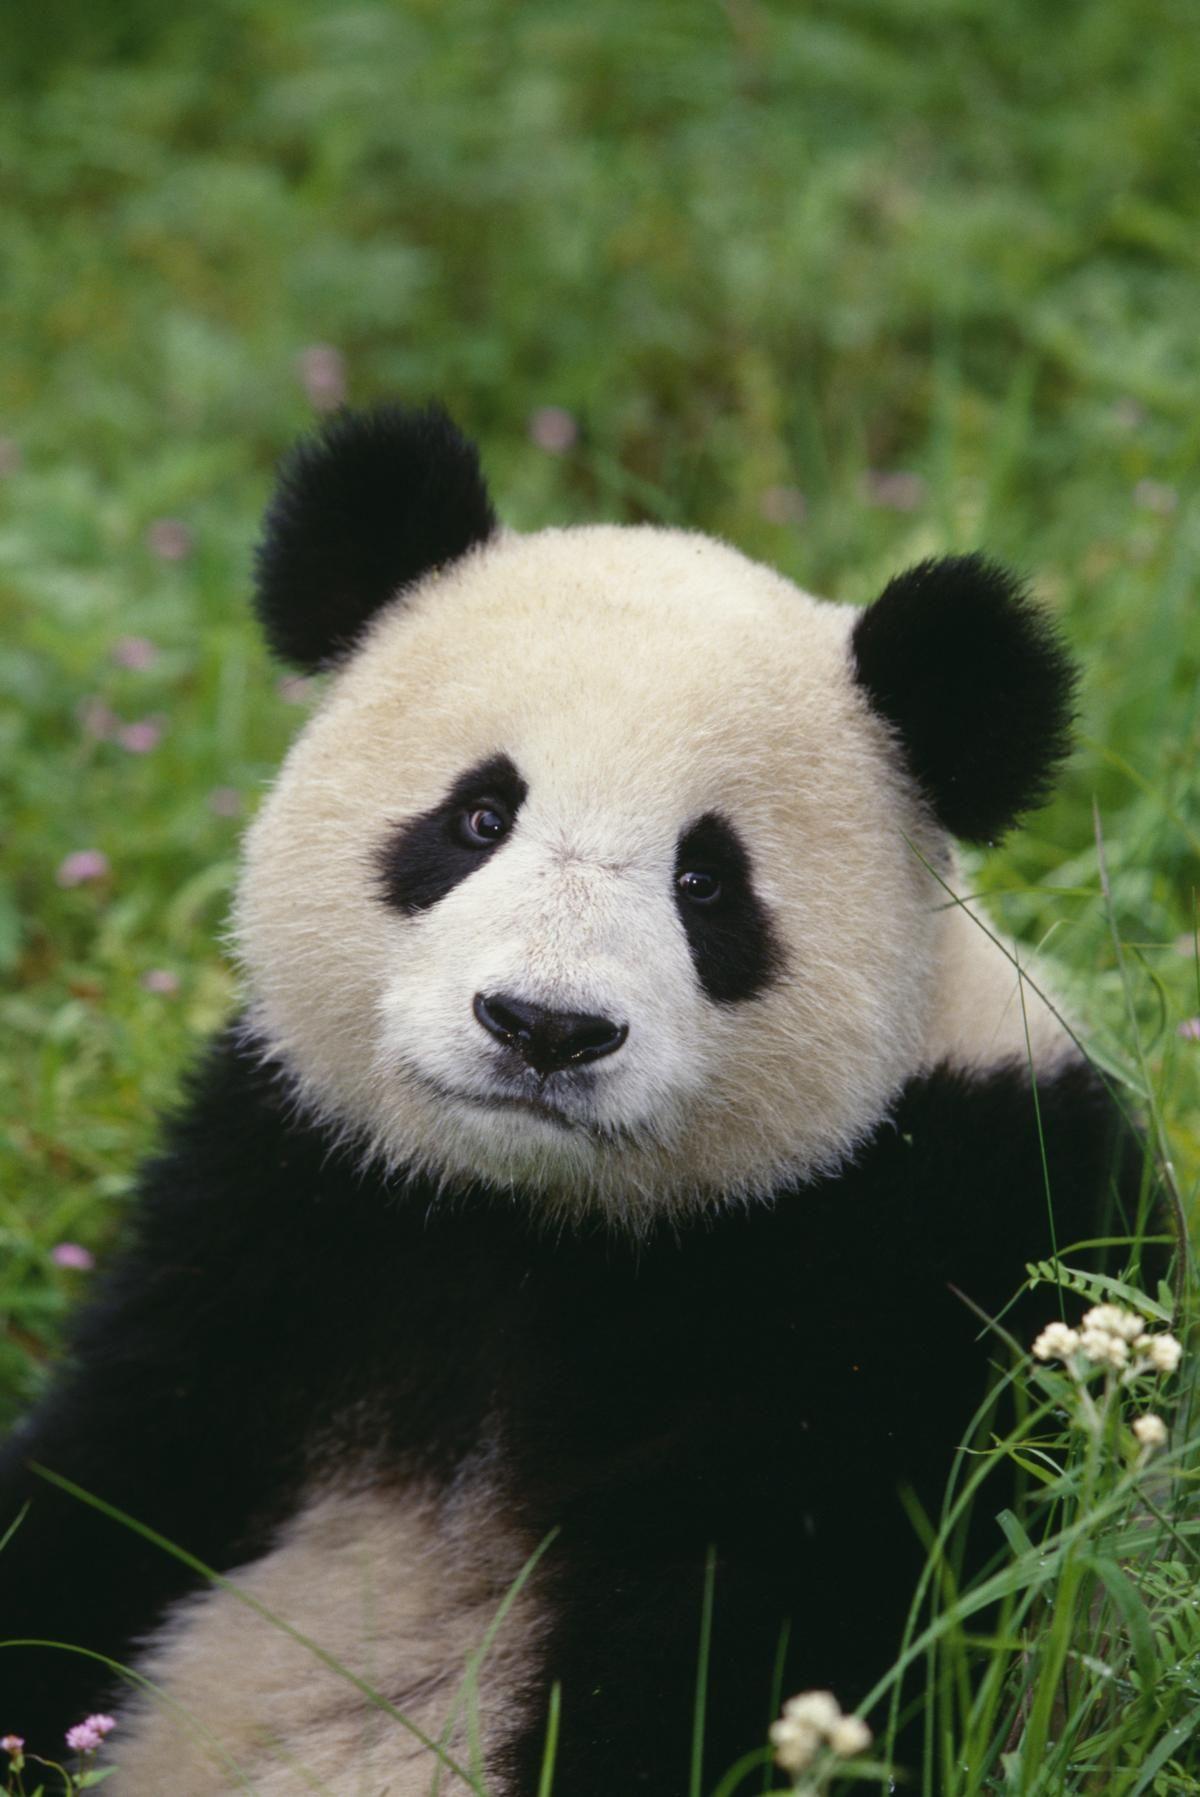 Discussions Endangered rainforest animals, Rainforest